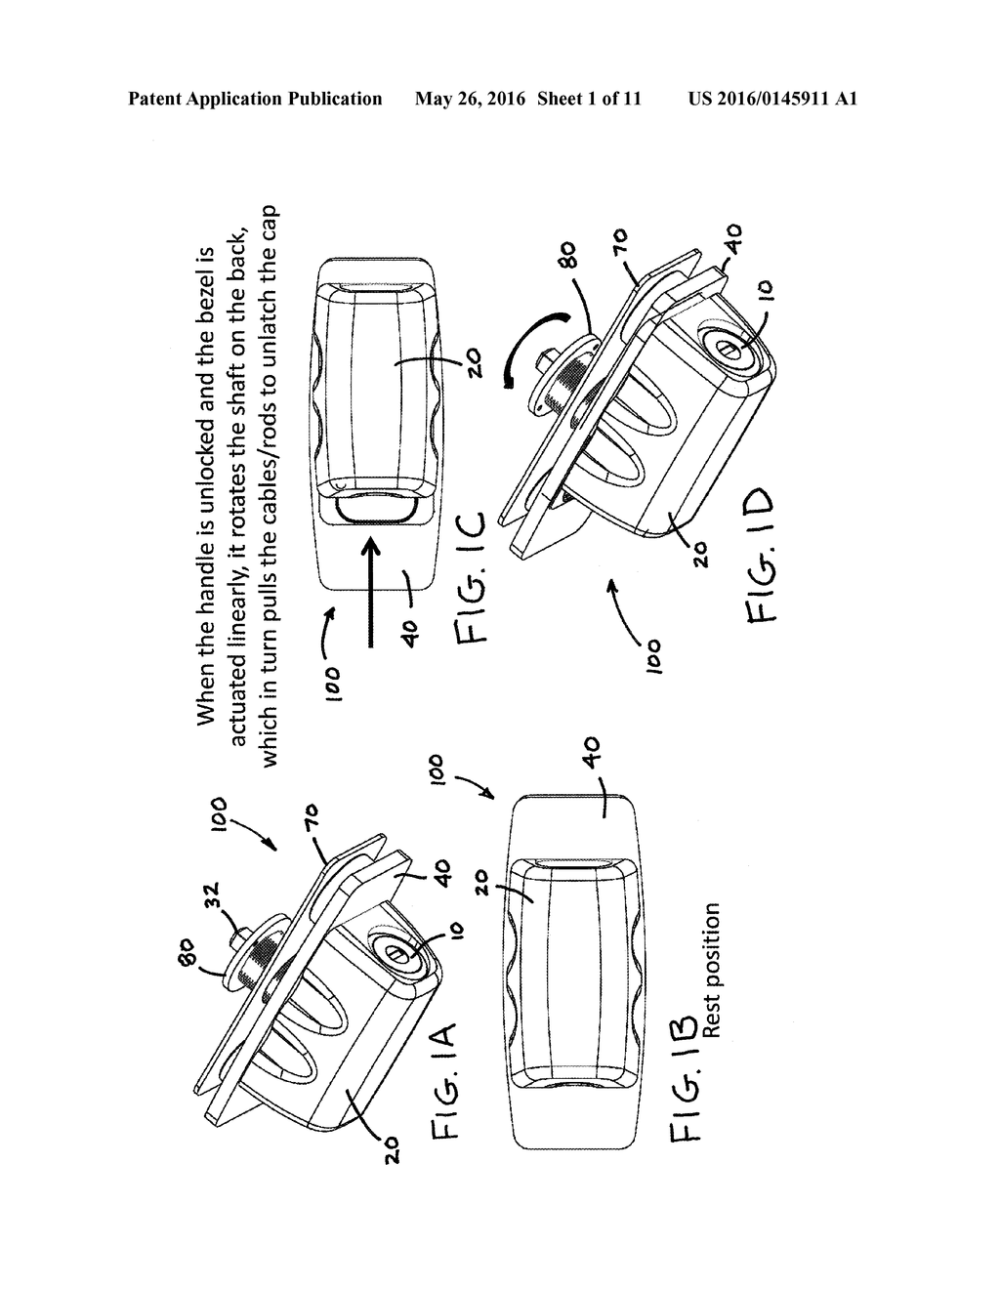 medium resolution of truck cap locks diagram wiring diagram todays rh 1 18 12 1813weddingbarn com hop cap truck camper hop cap truck camper